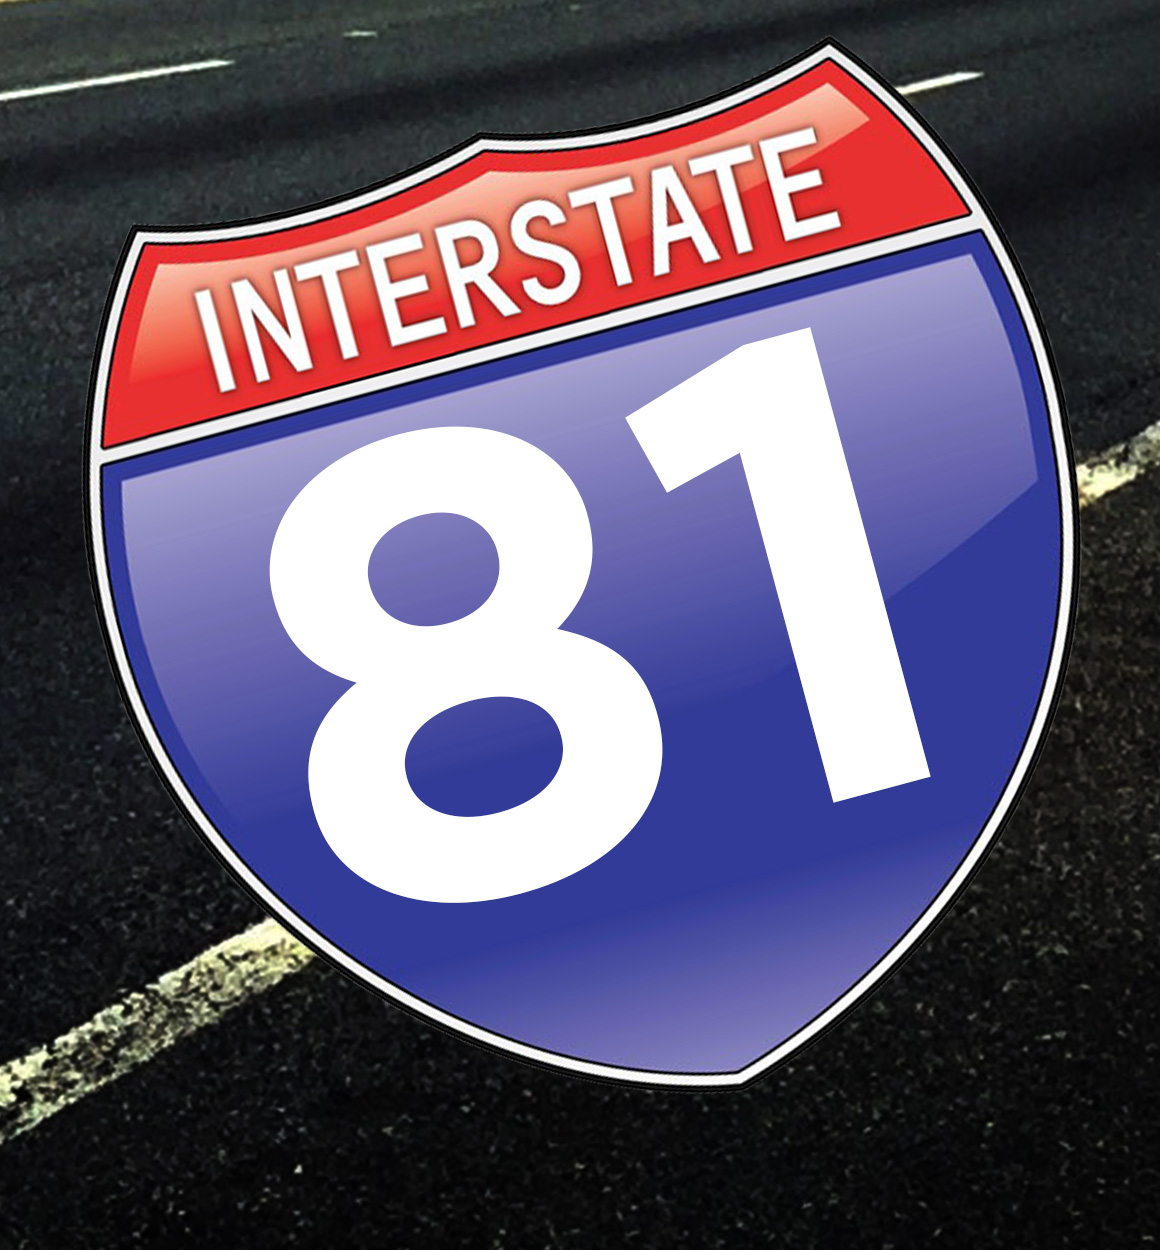 interstate 81 ots_1554321960548.jpg.jpg